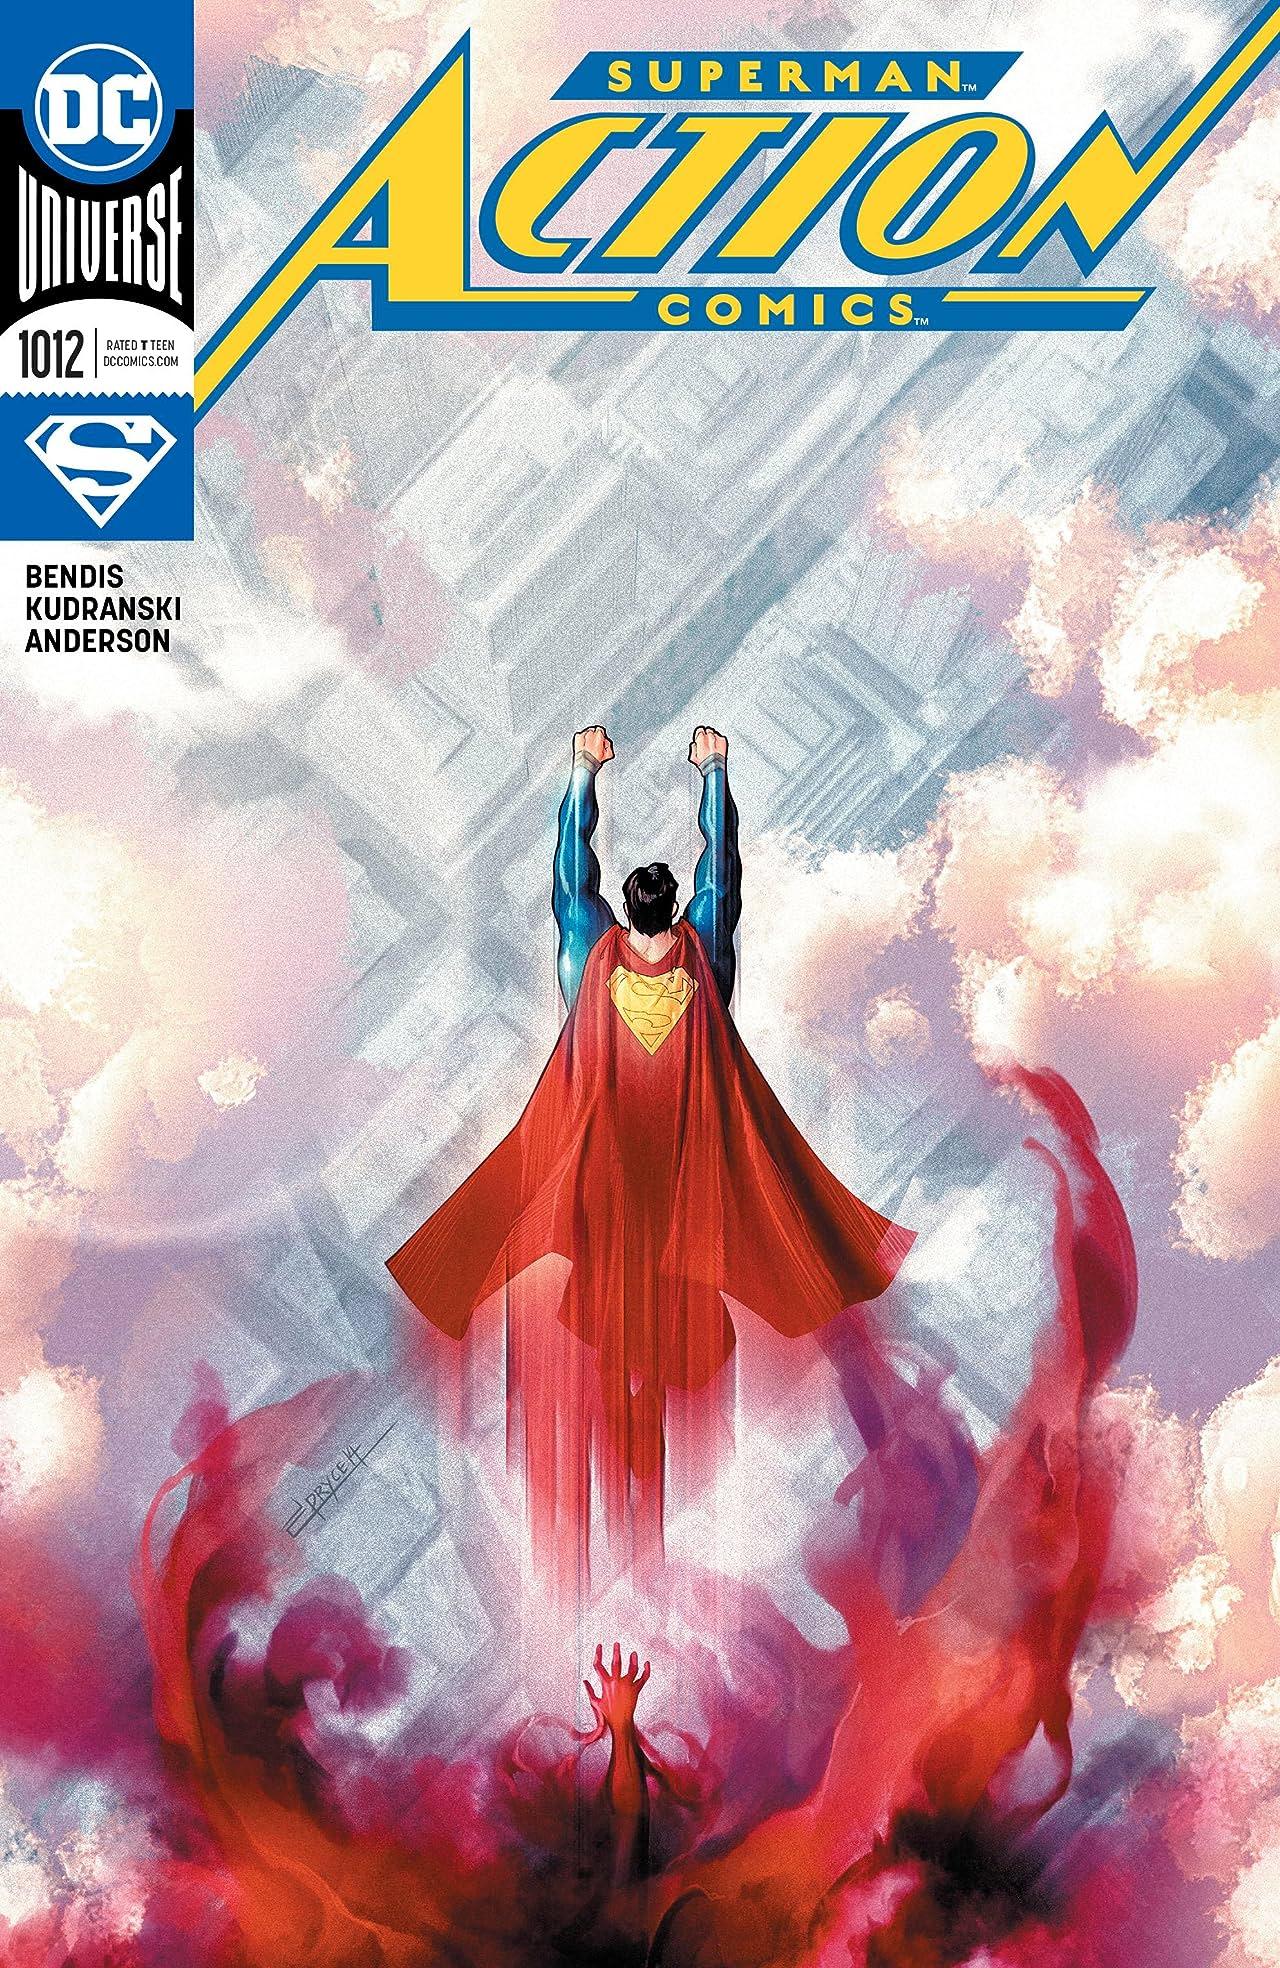 action comics 1012